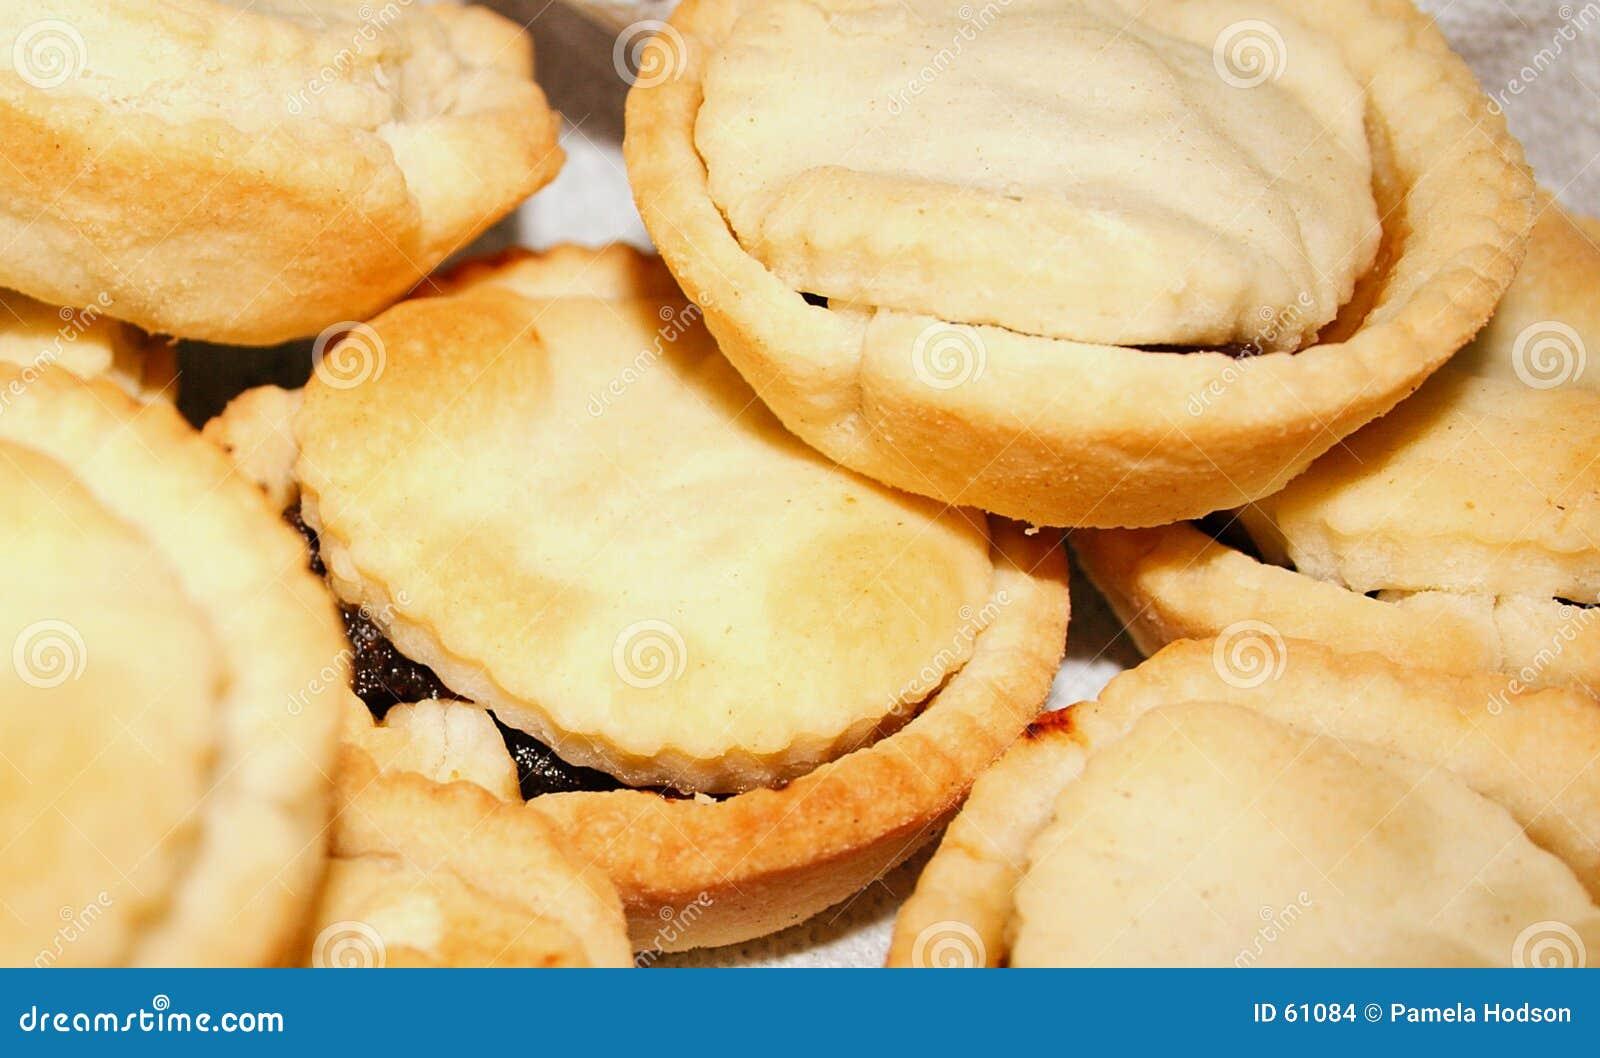 Fruit pies